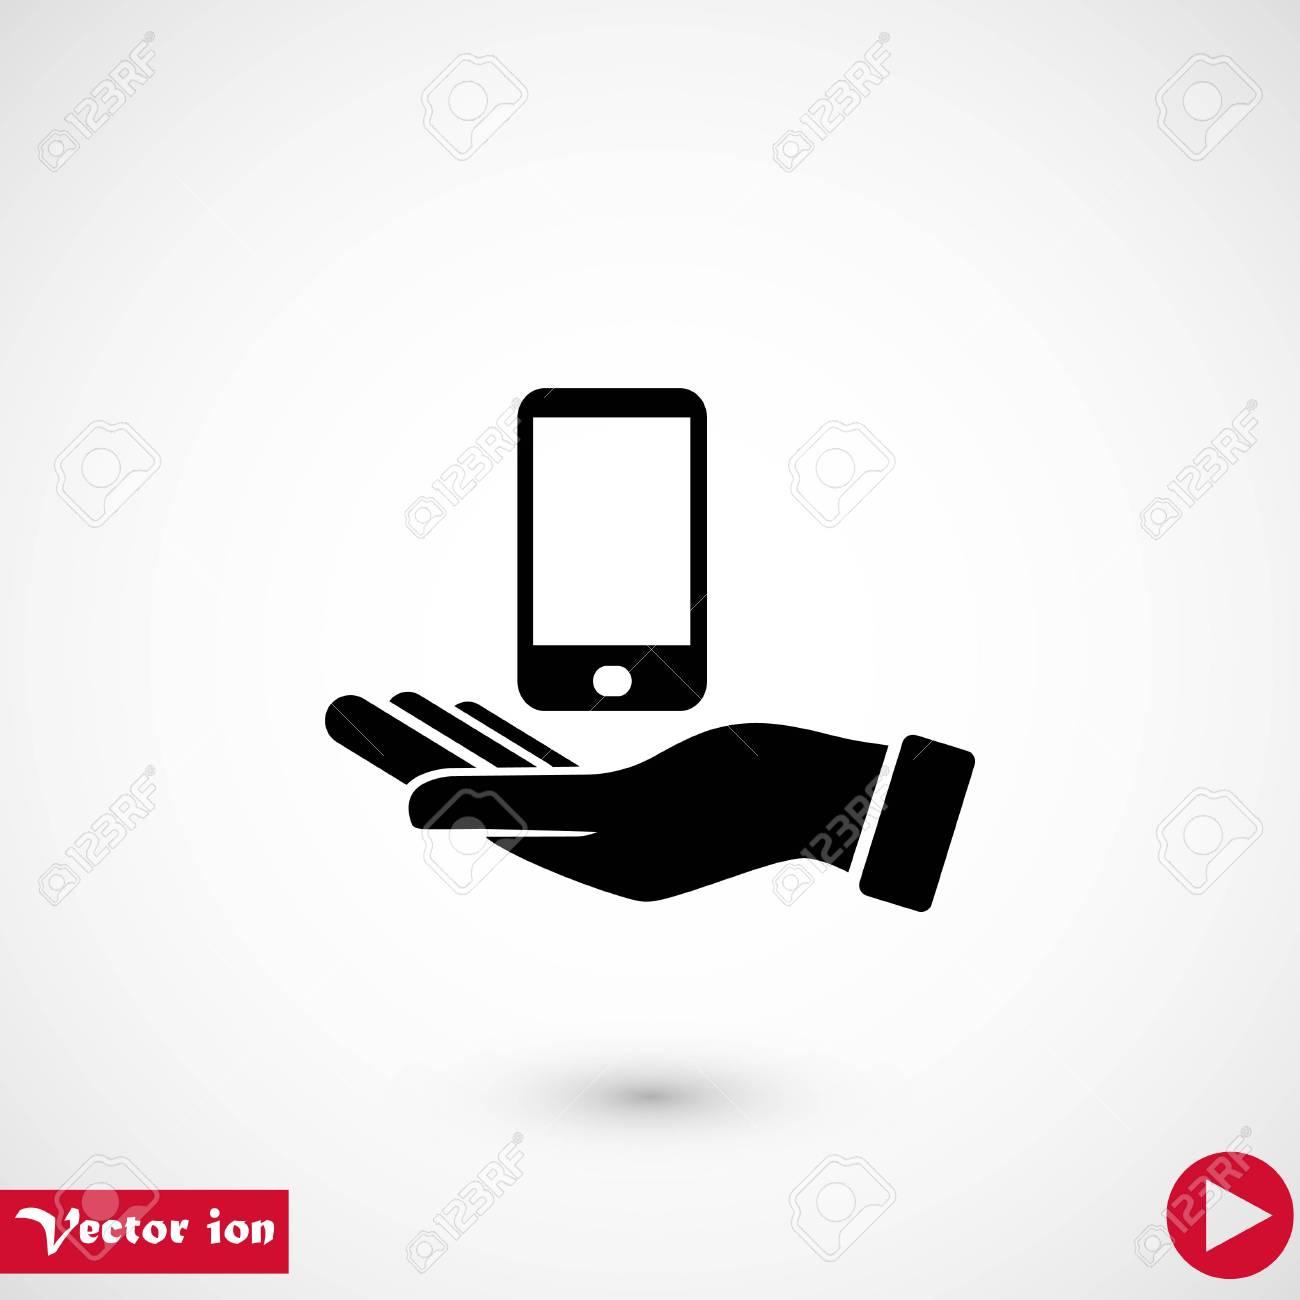 capture mobile icon flat